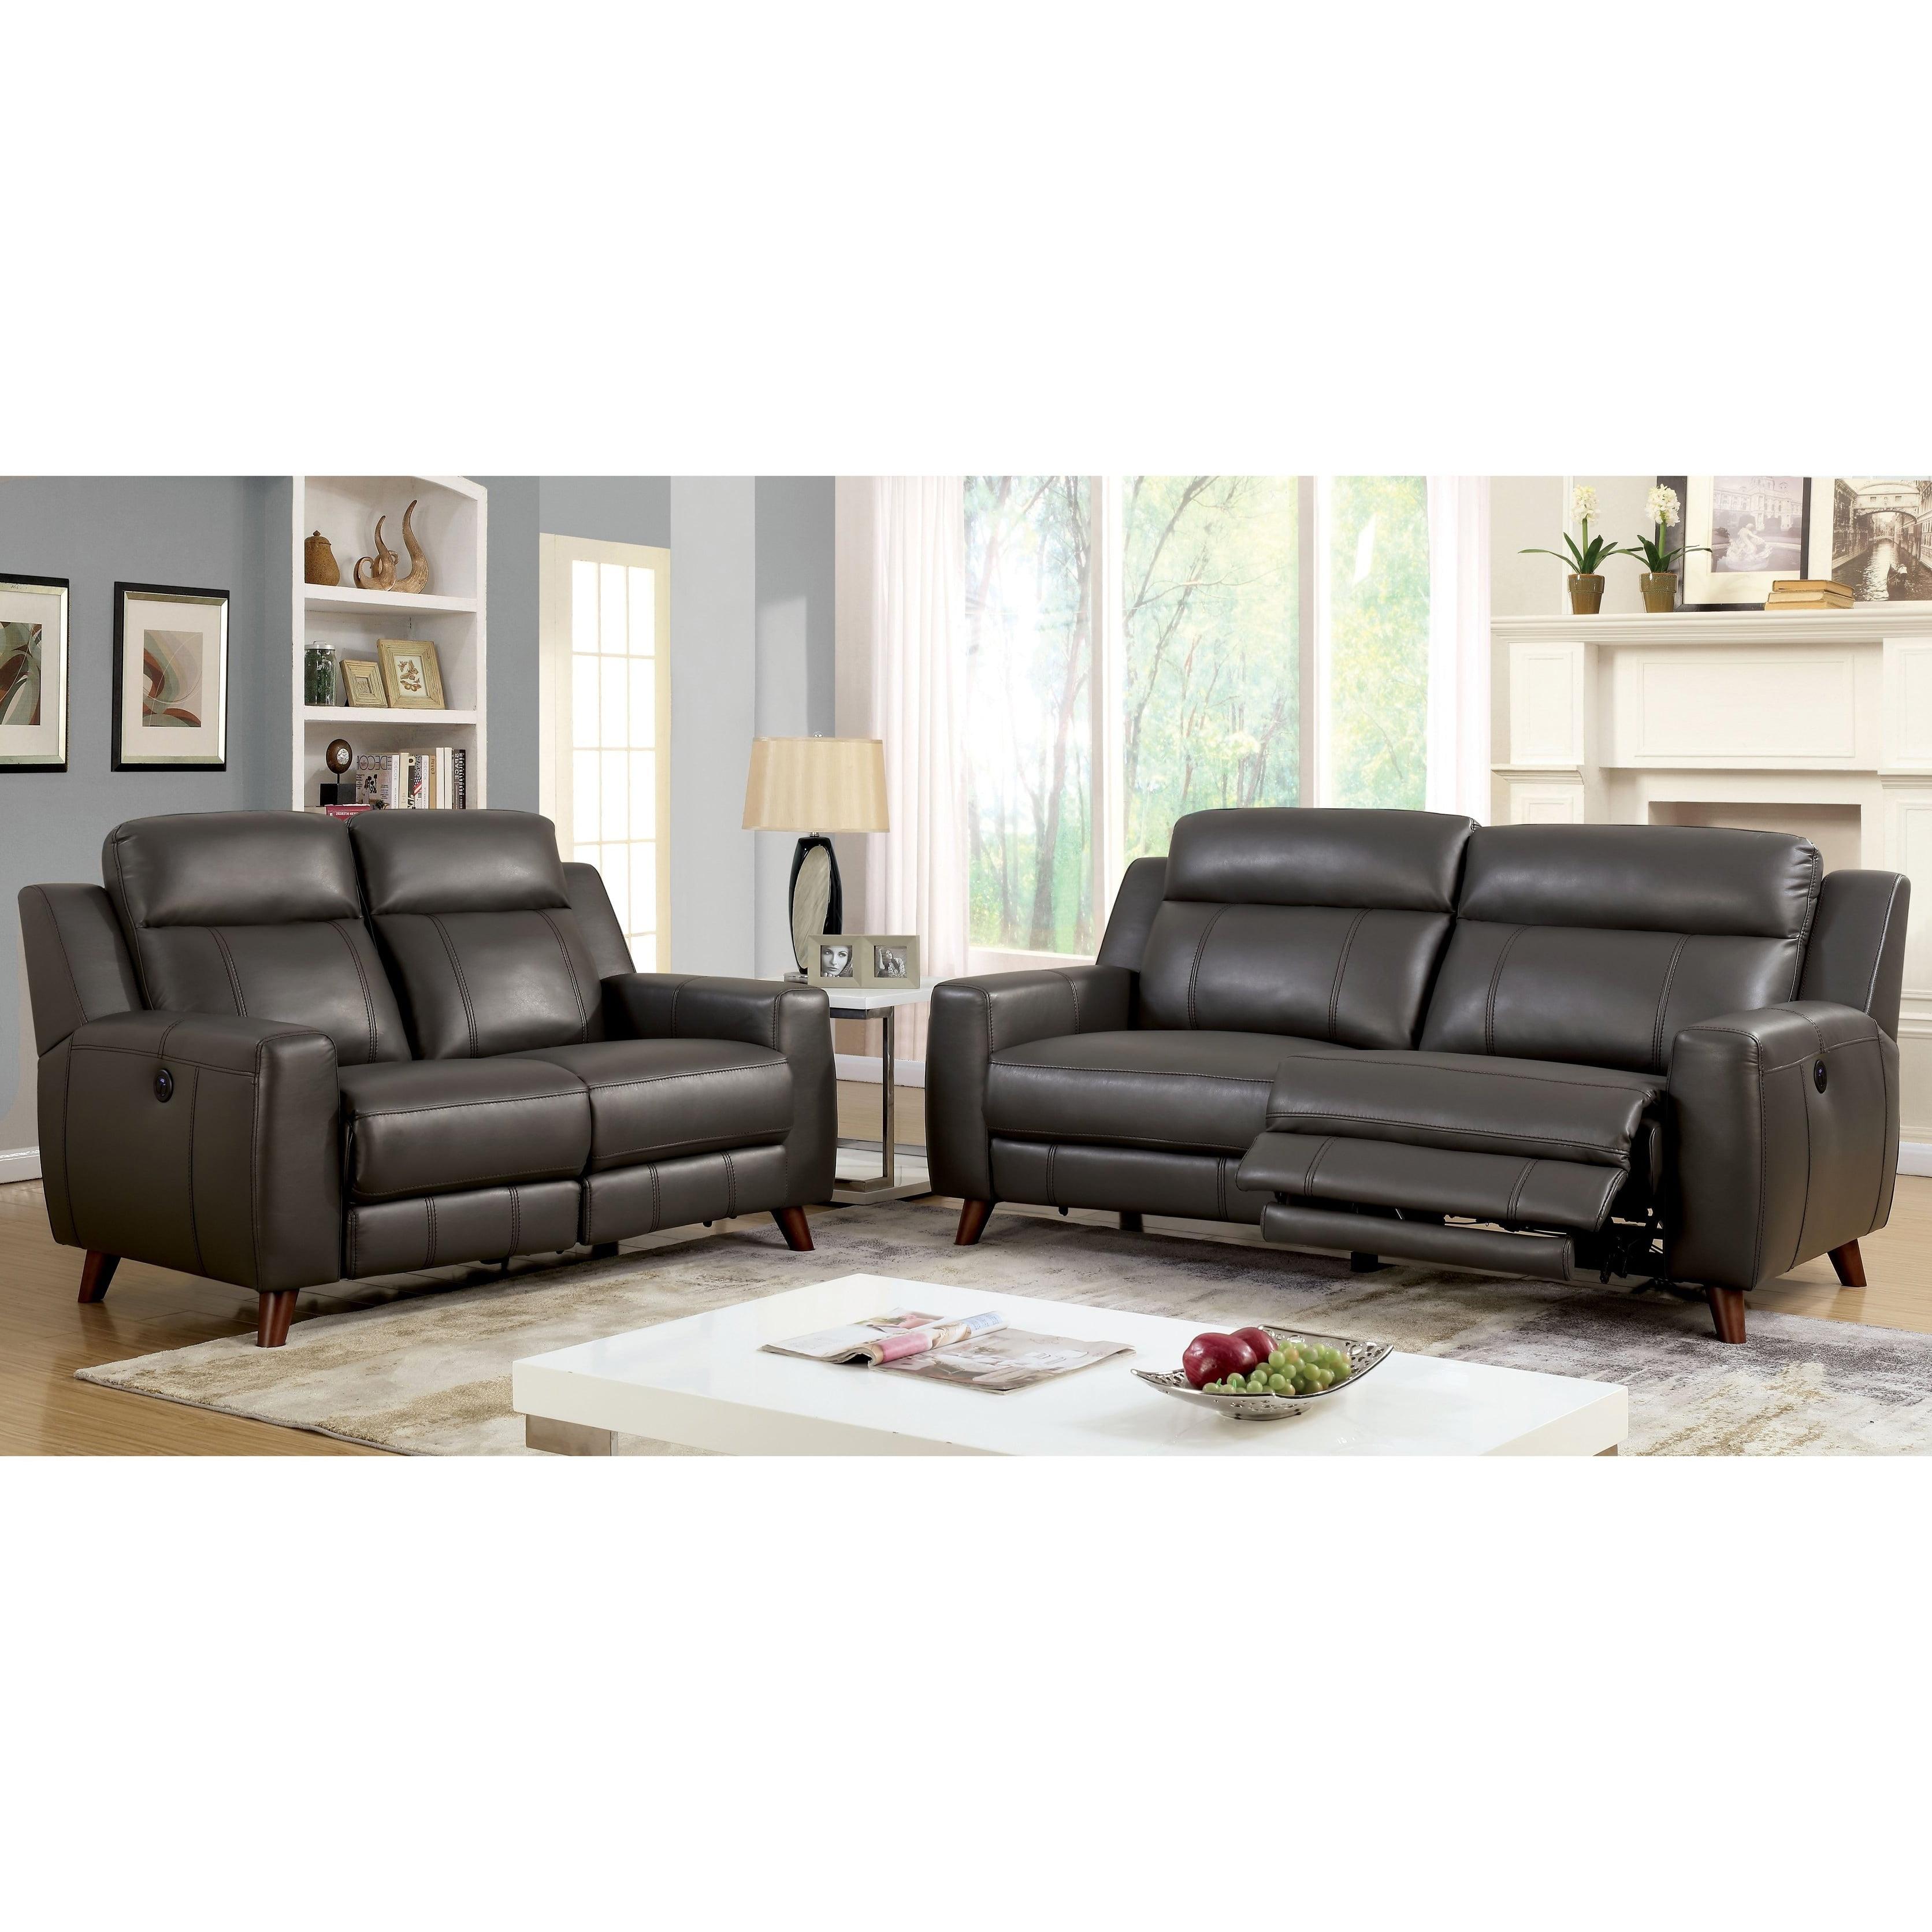 Furniture of America Zass Contemporary Grey 2-piece Reclining Sofa